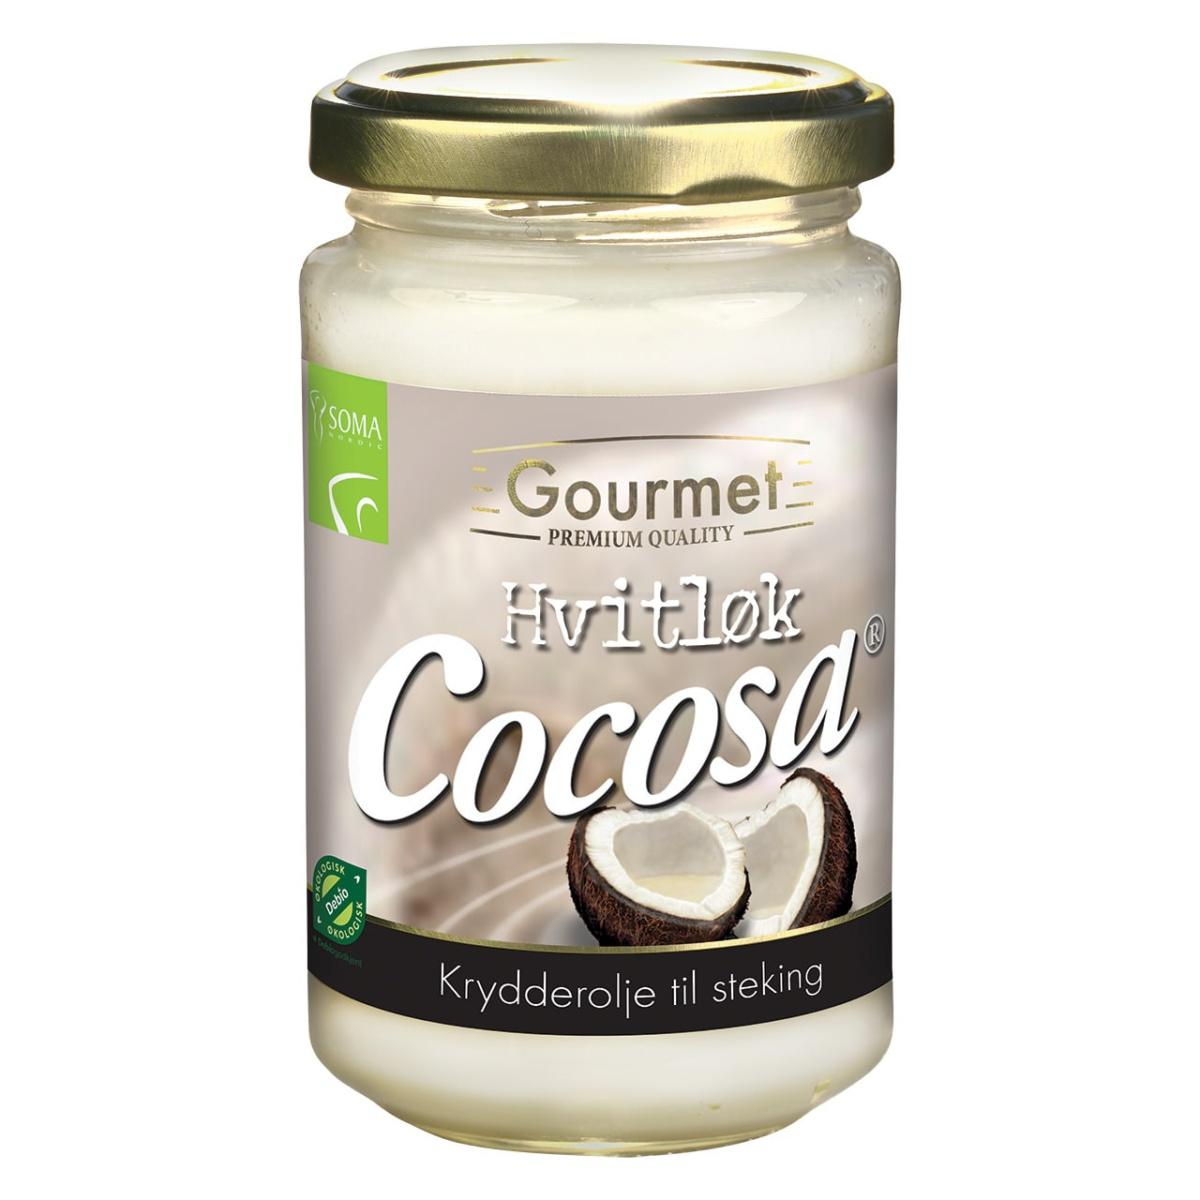 Cocosa Gourmet Hvitløk